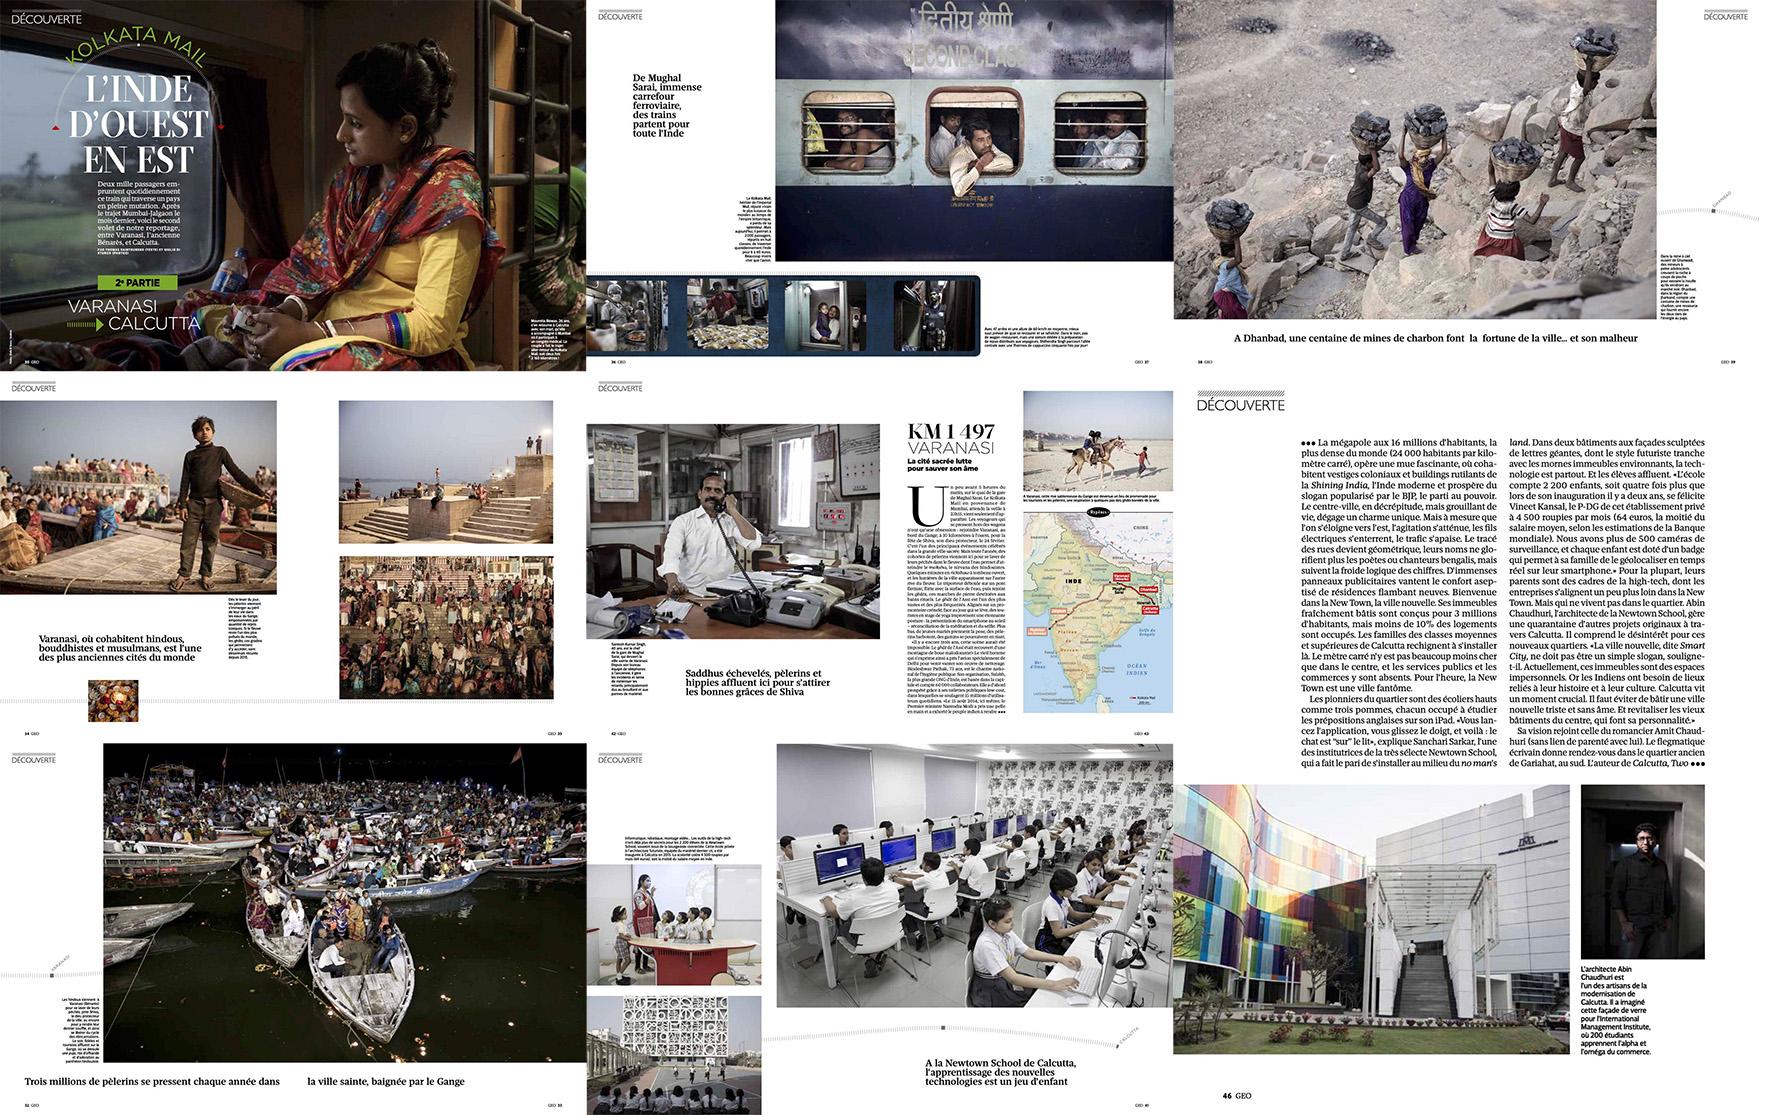 Kolkata Mail for Geo France